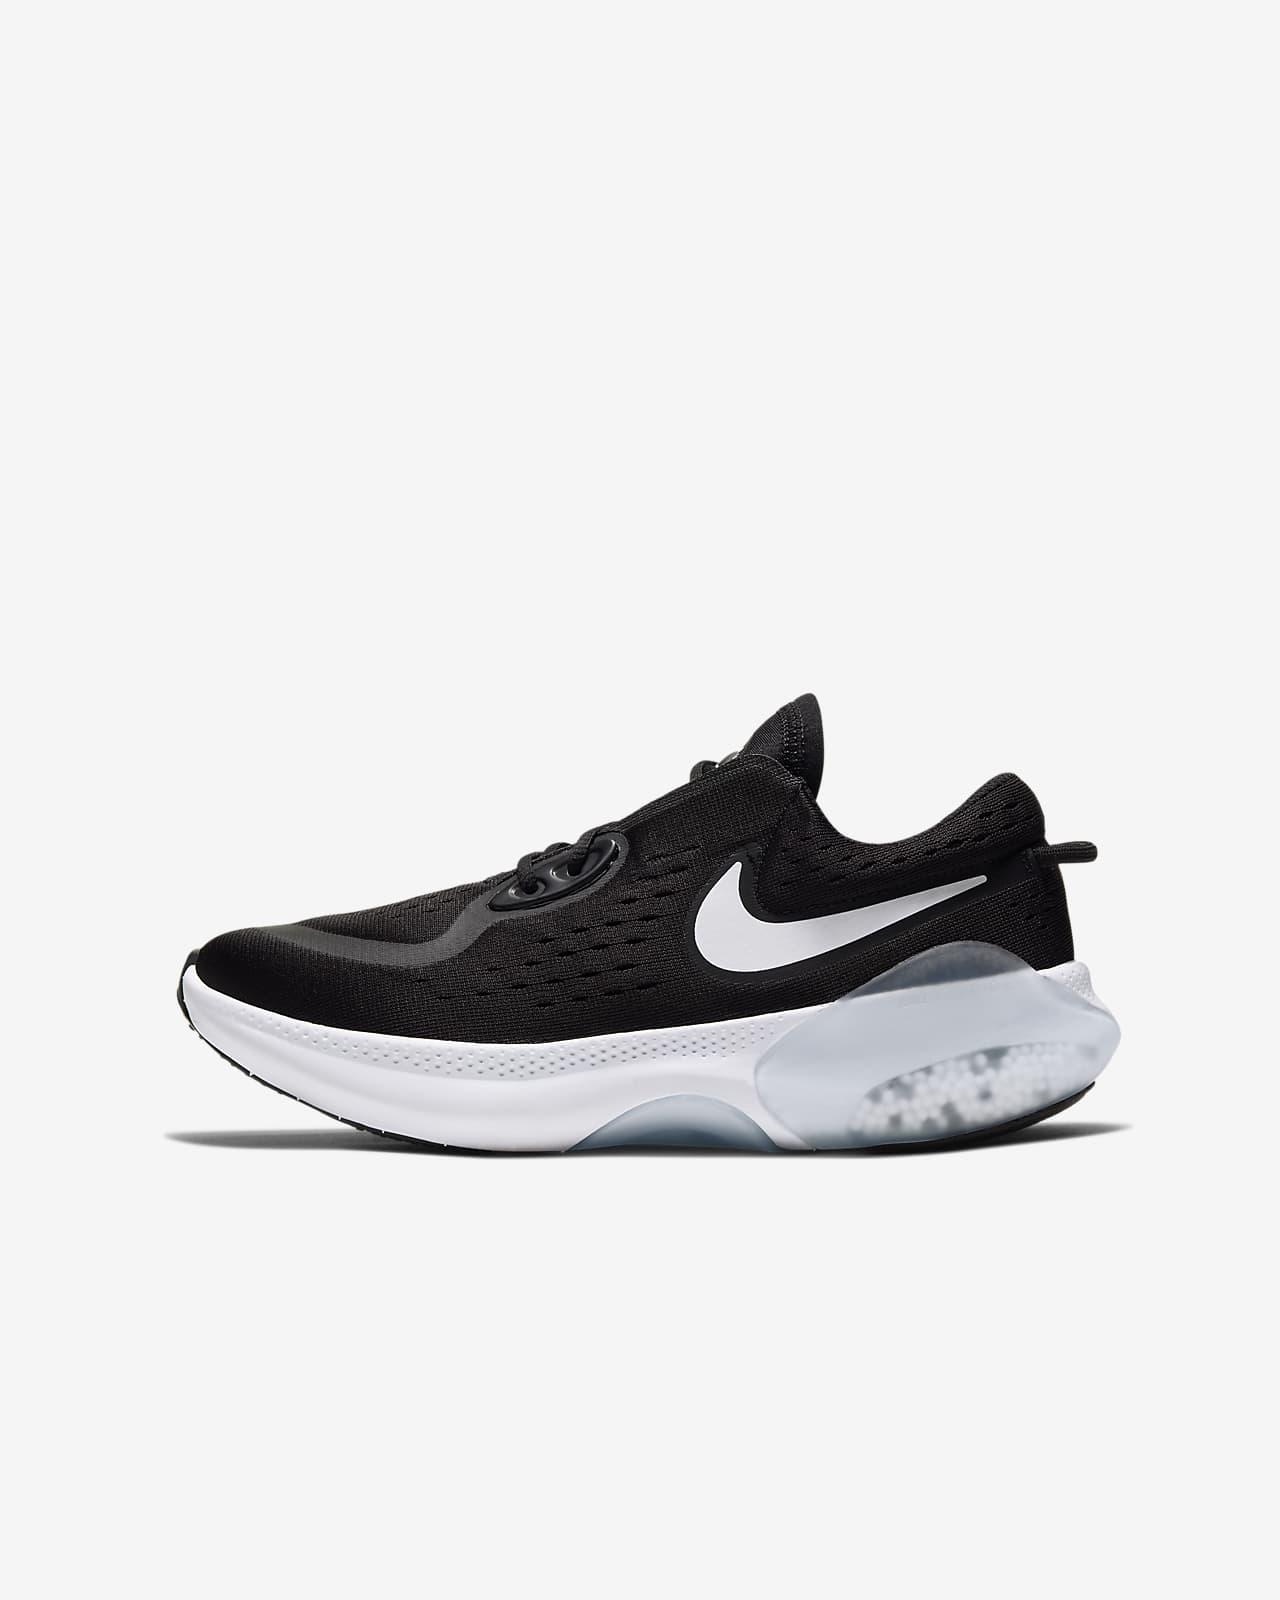 Nike Joyride Dual Run Big Kids' Running Shoe